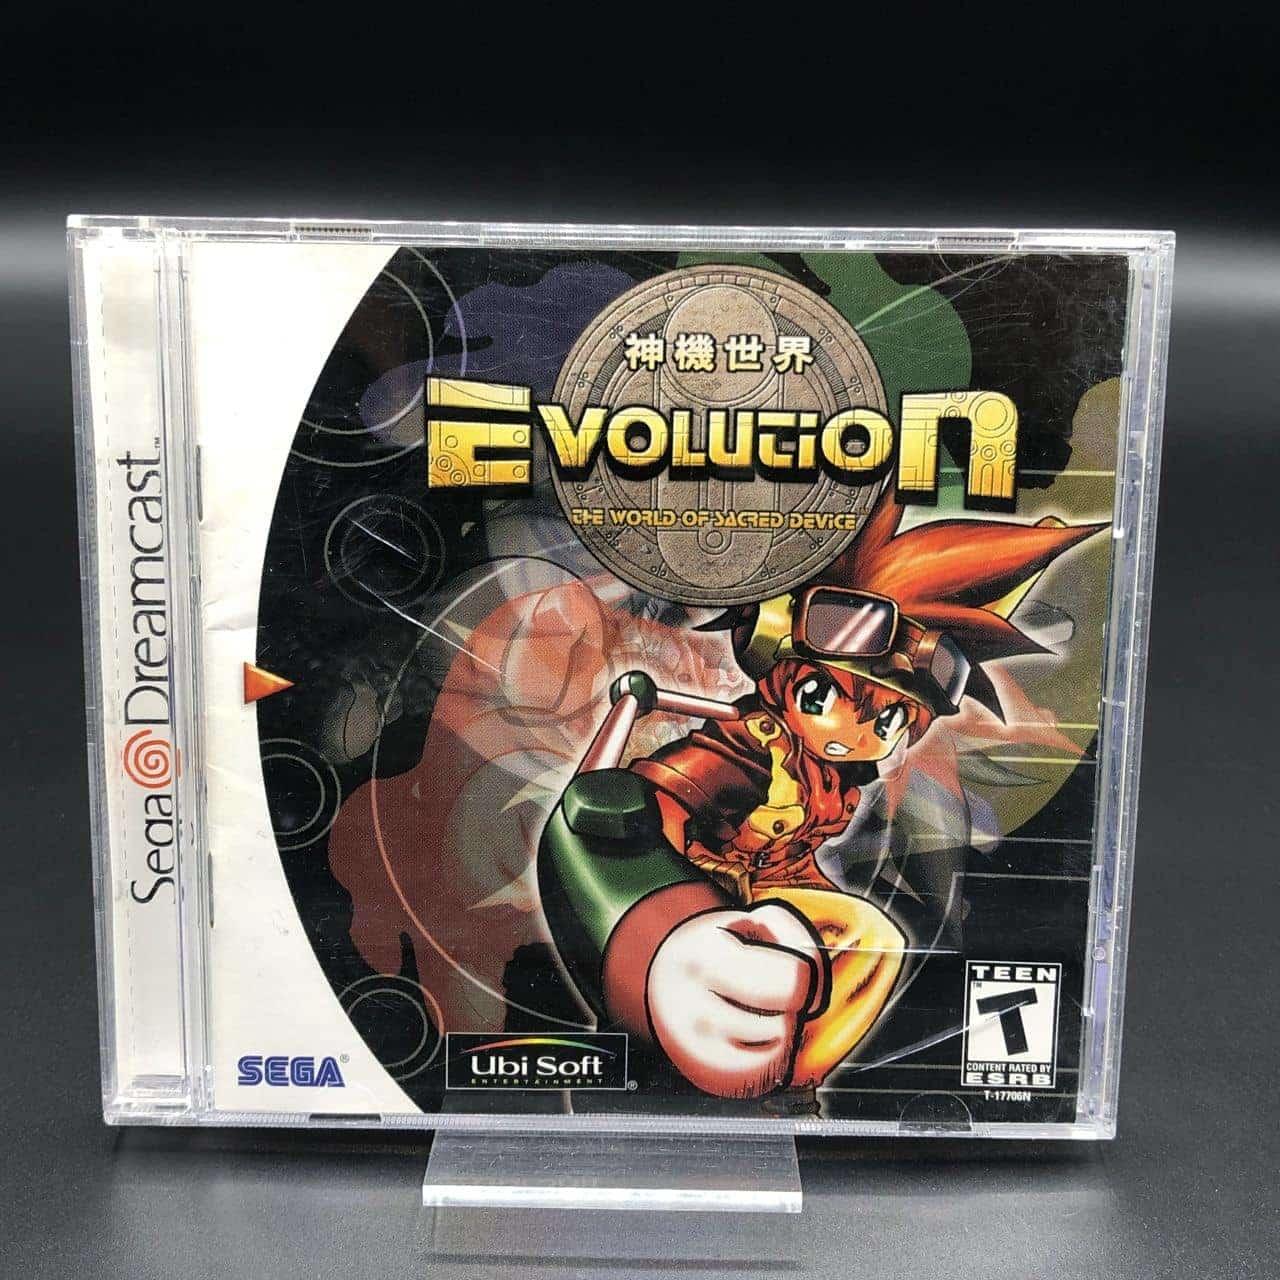 Evolution (Import USA) (Komplett) (Sehr gut) Sega Dreamcast